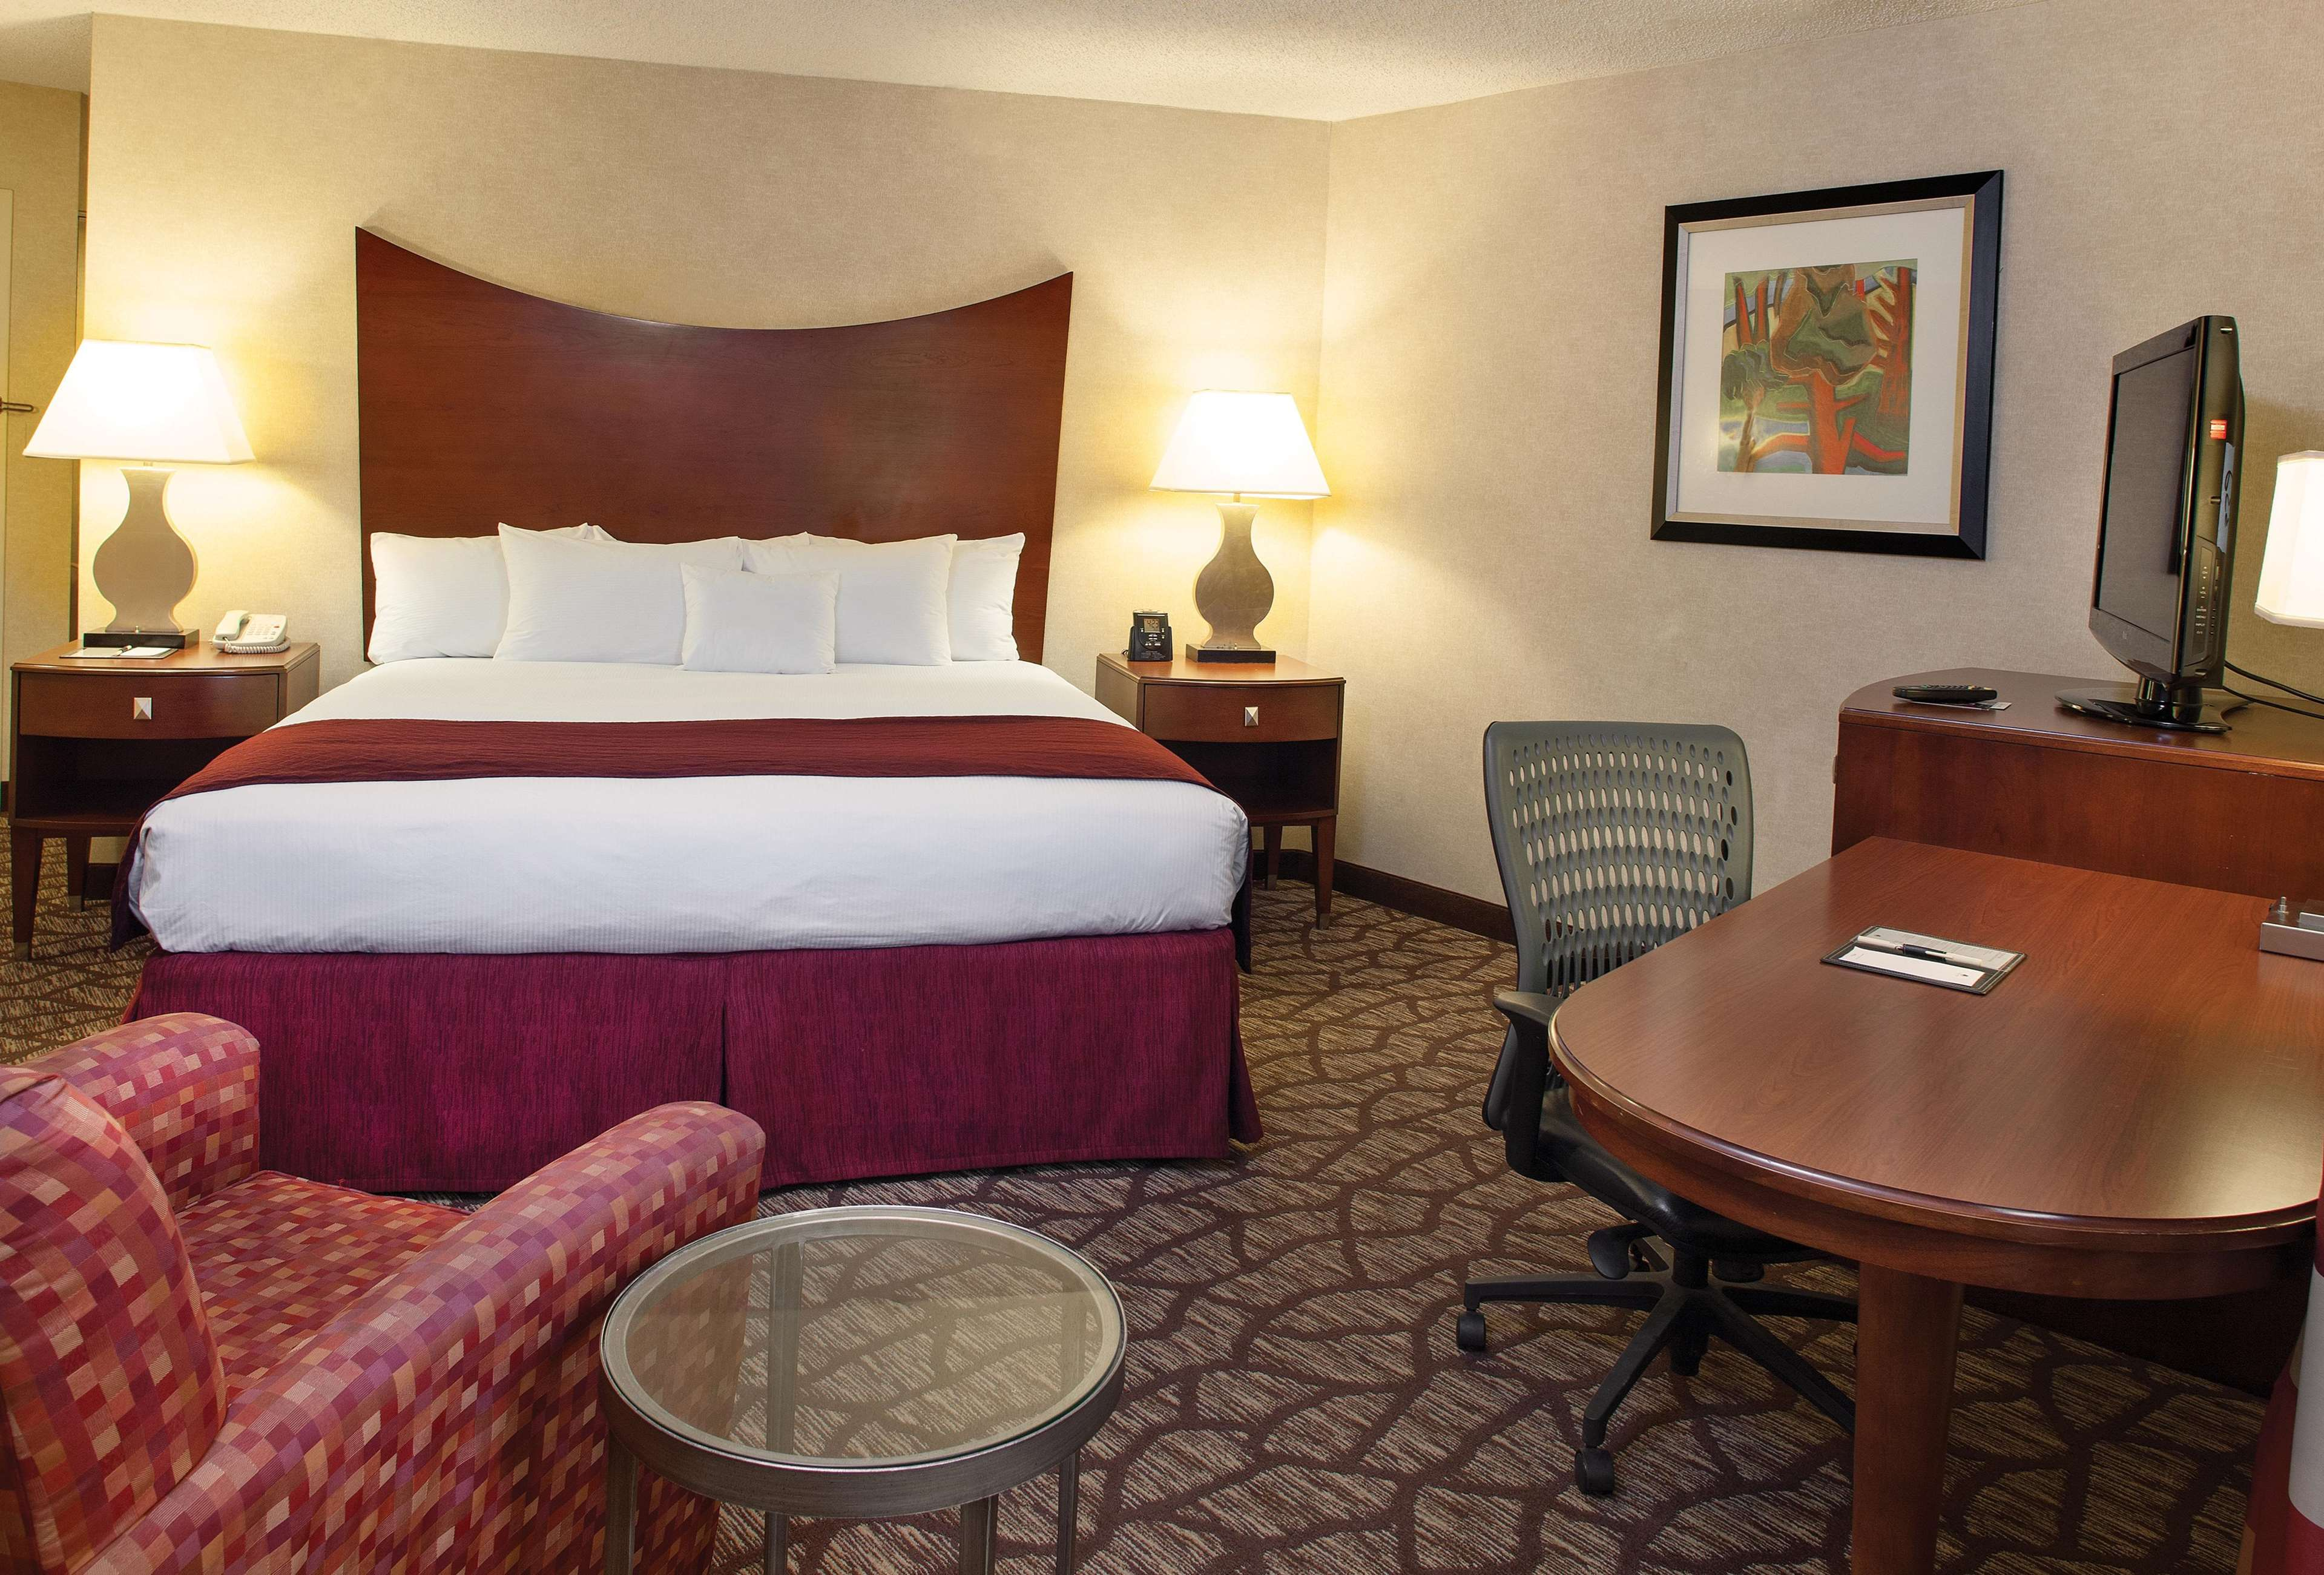 DoubleTree by Hilton Hotel Oak Ridge - Knoxville image 37